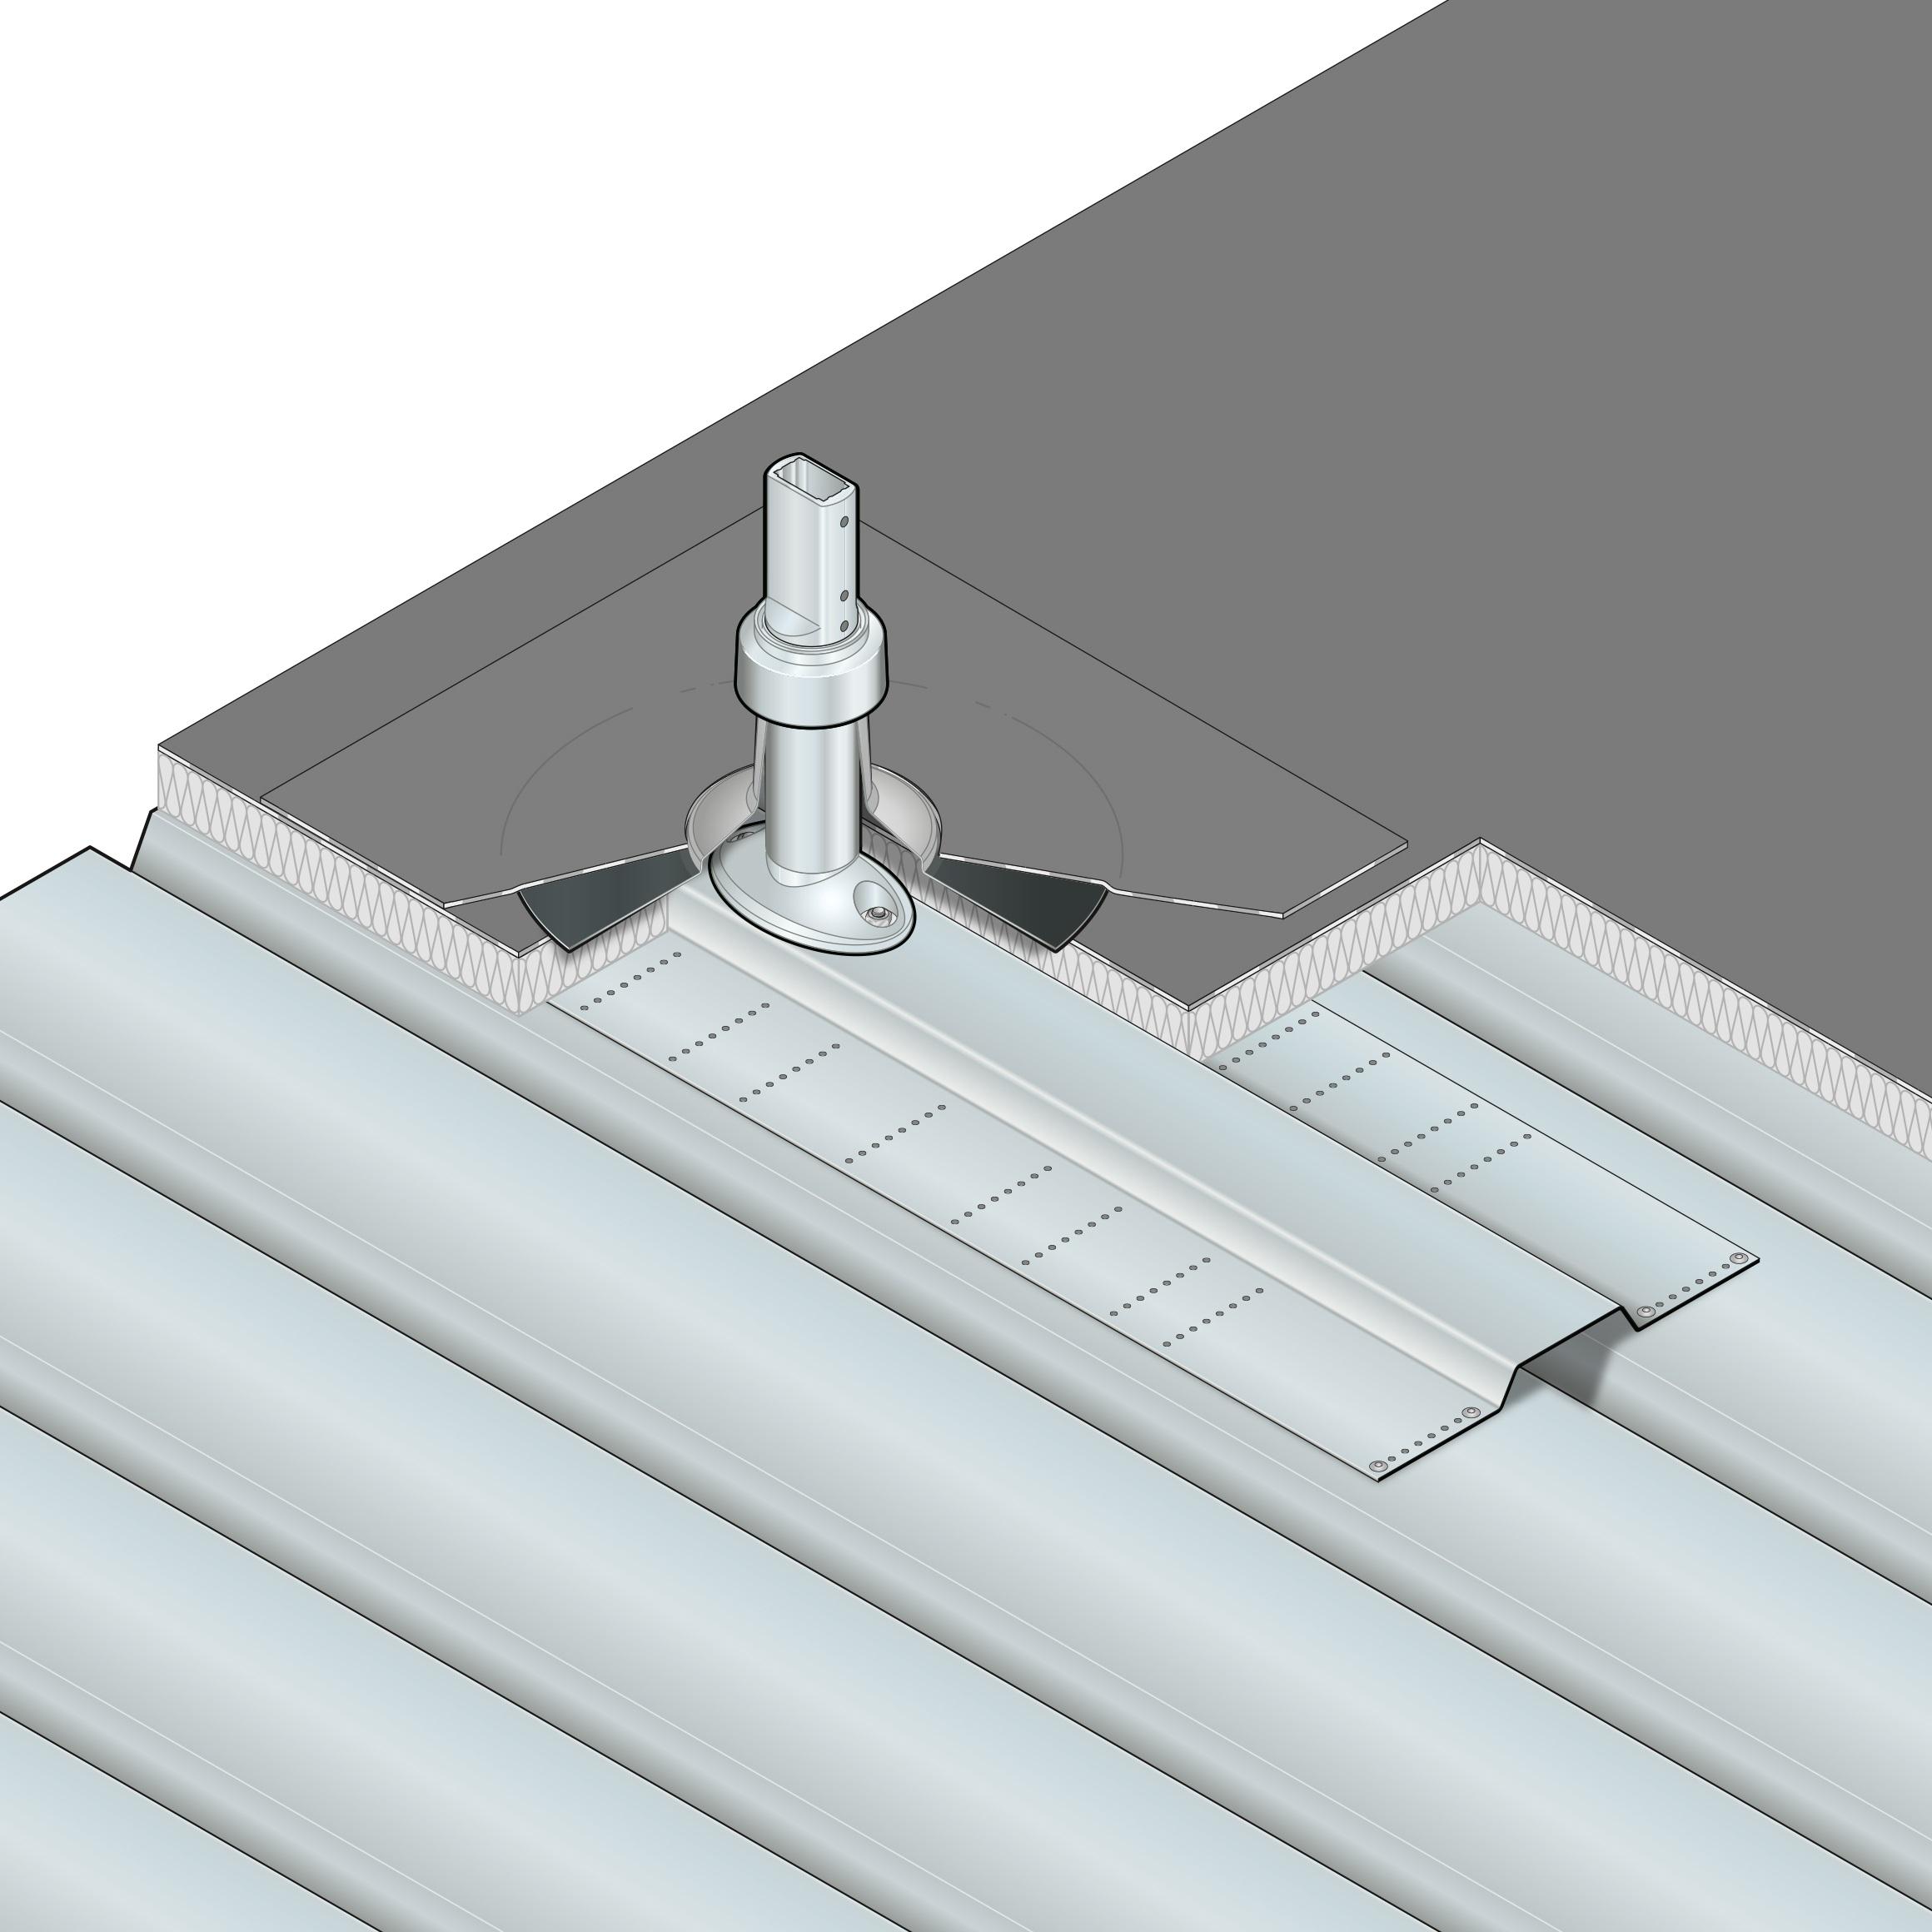 fixation bac acier toiture simple fixation bac acier toiture with fixation bac acier toiture. Black Bedroom Furniture Sets. Home Design Ideas